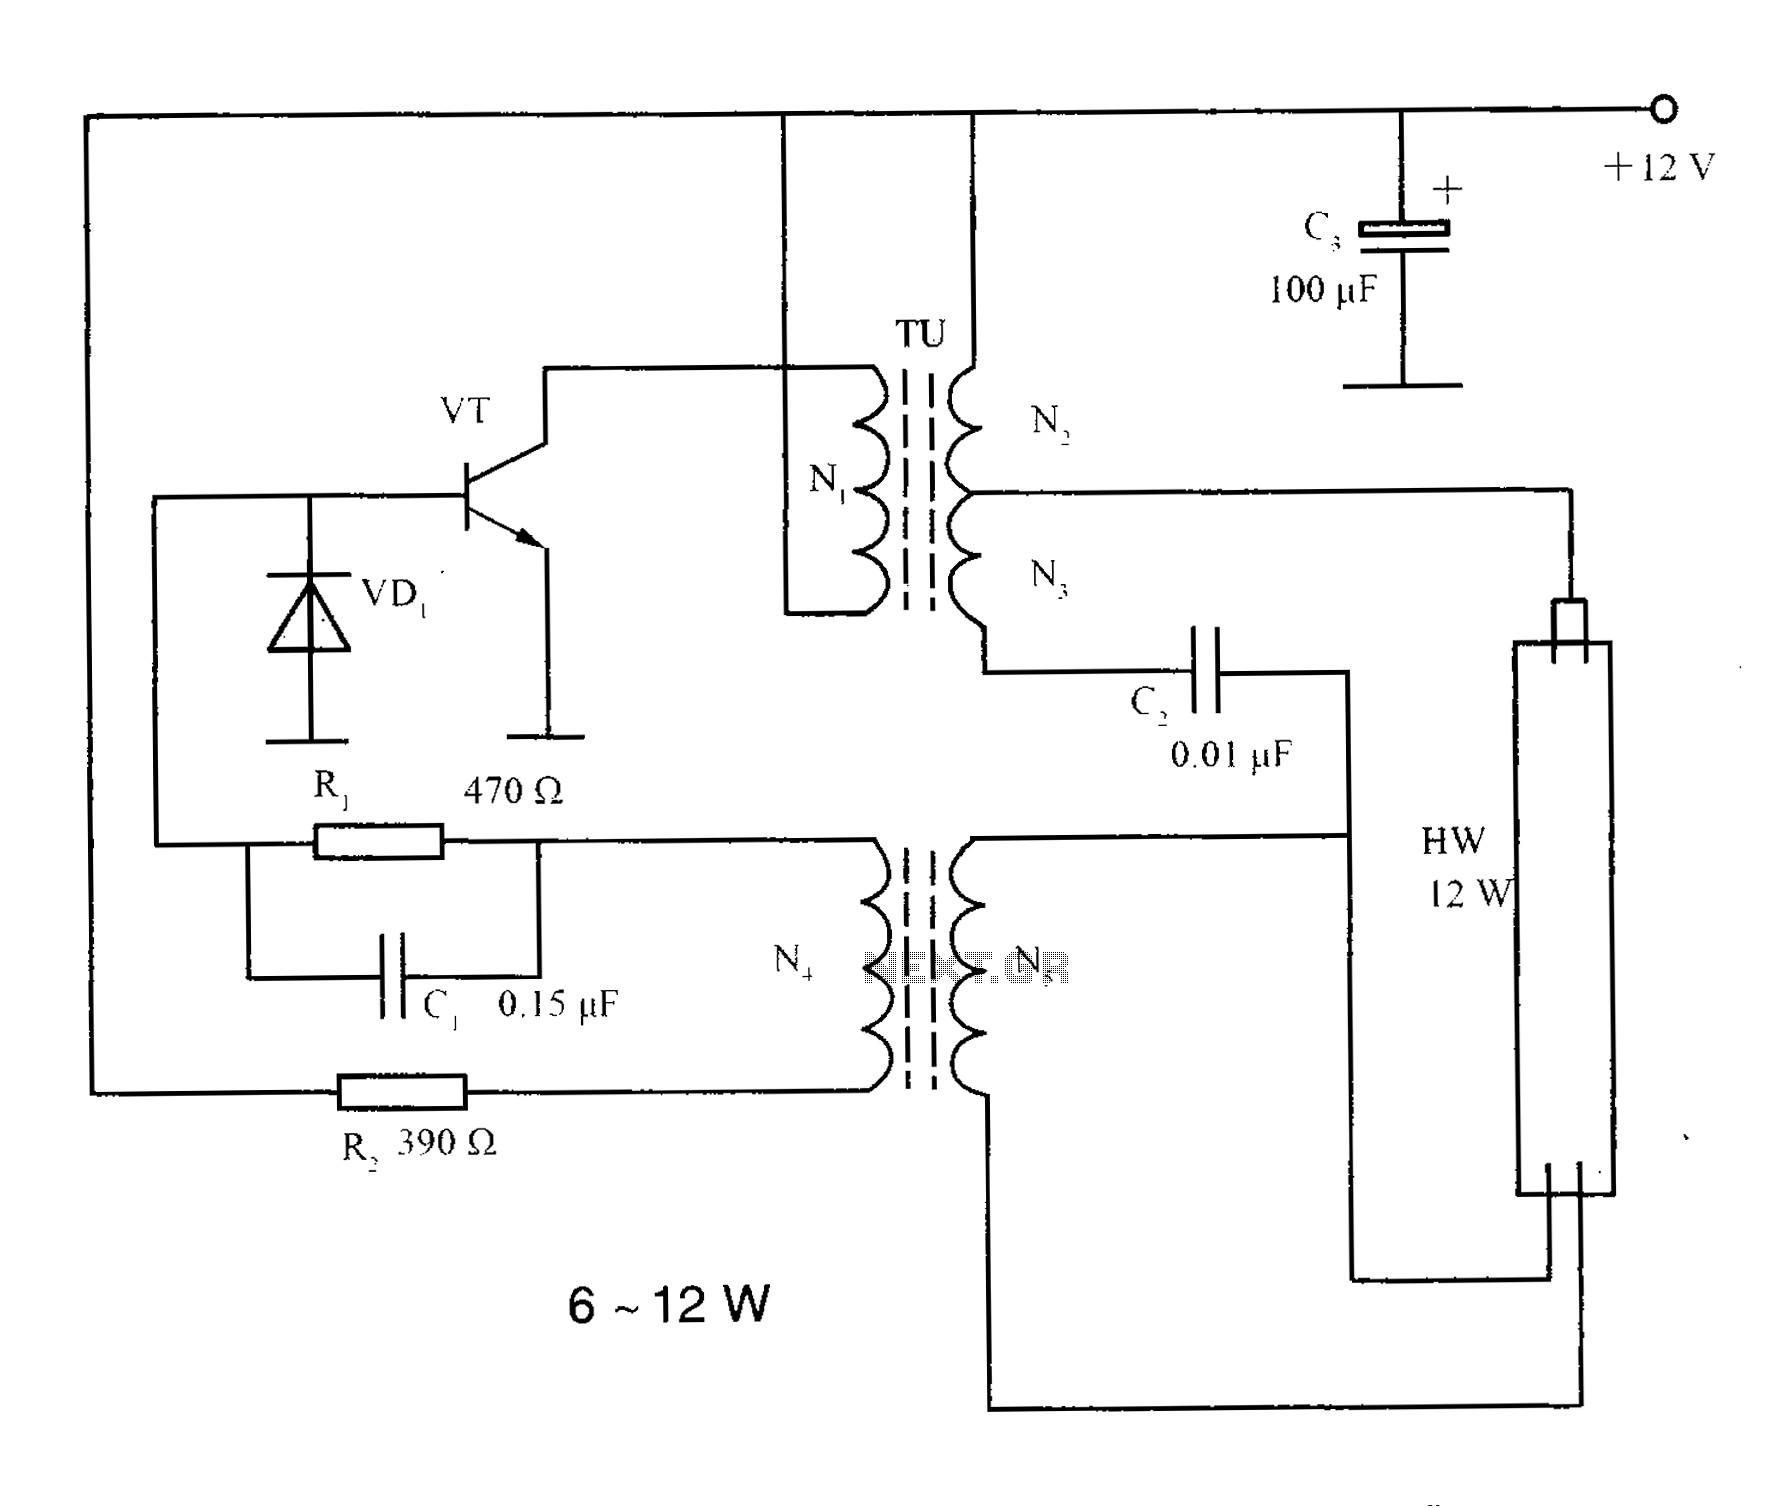 Fluorescent Circuit Light Laser Led Circuits Next Gr Lighting Inverter Principle 12w Lamps circuit drawing